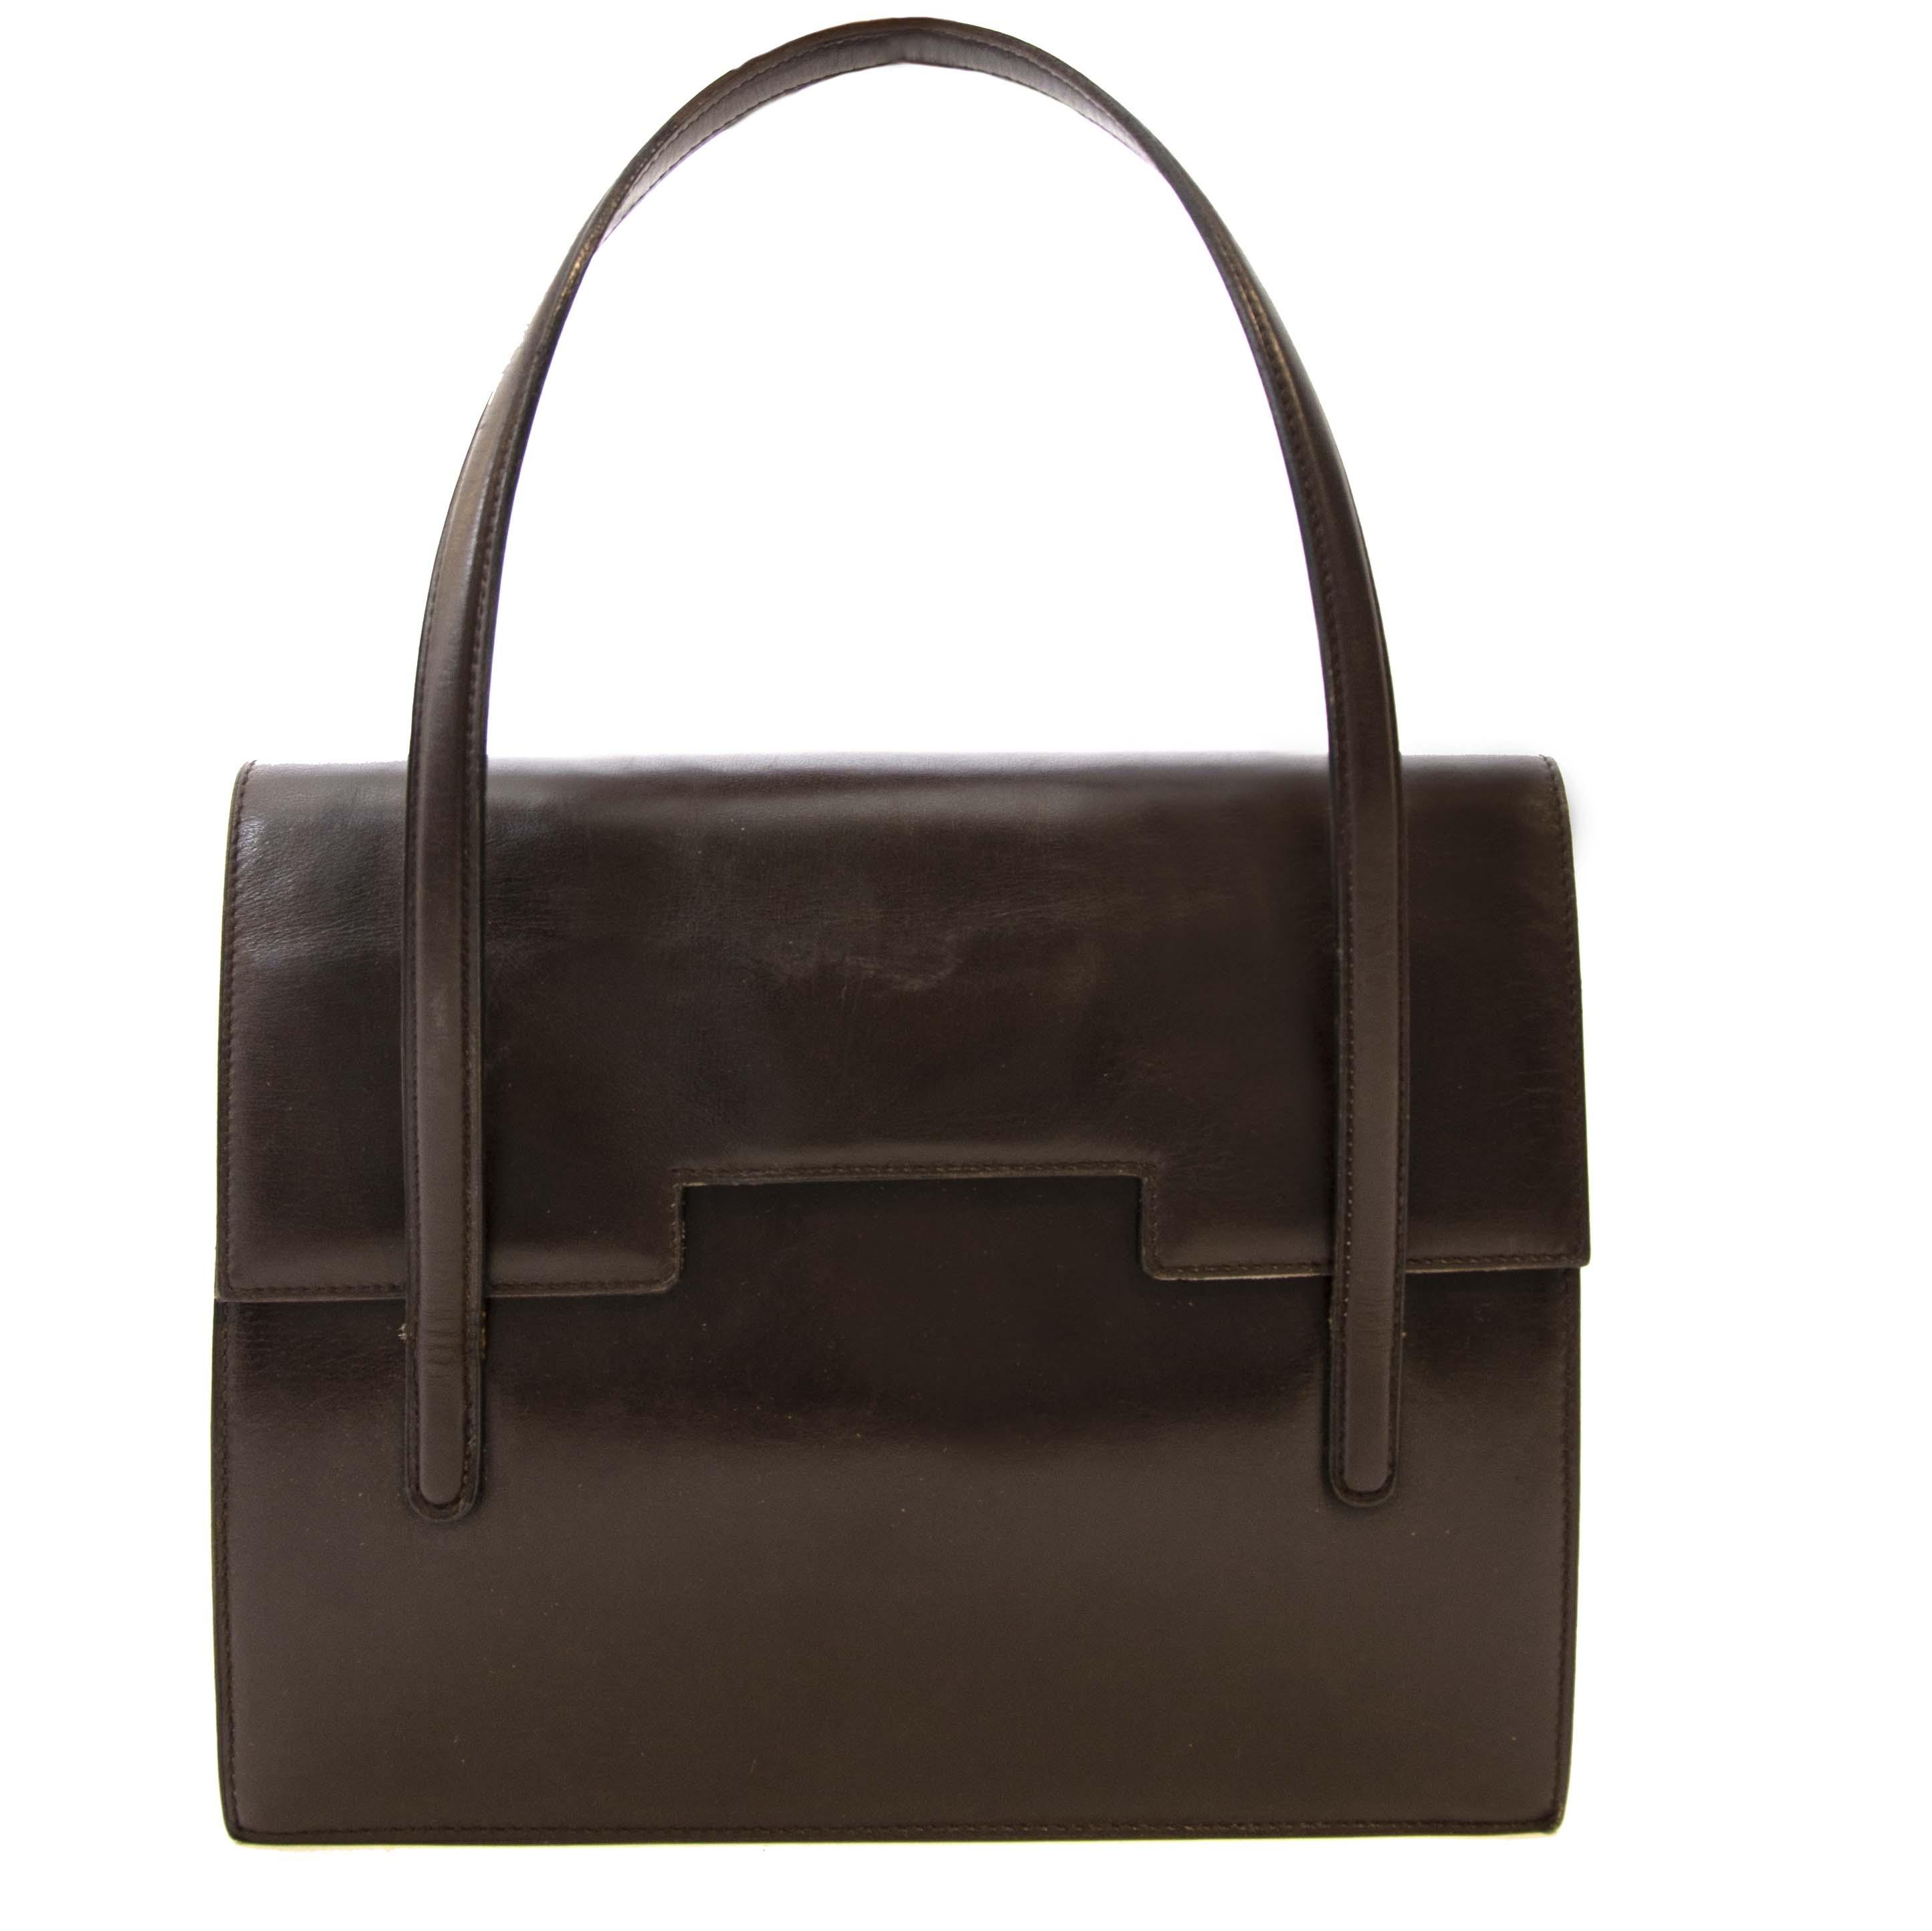 Secondhand Delvaux Brown Box Calf Leather Shoulder Bag at Labellov. Safe online shopping